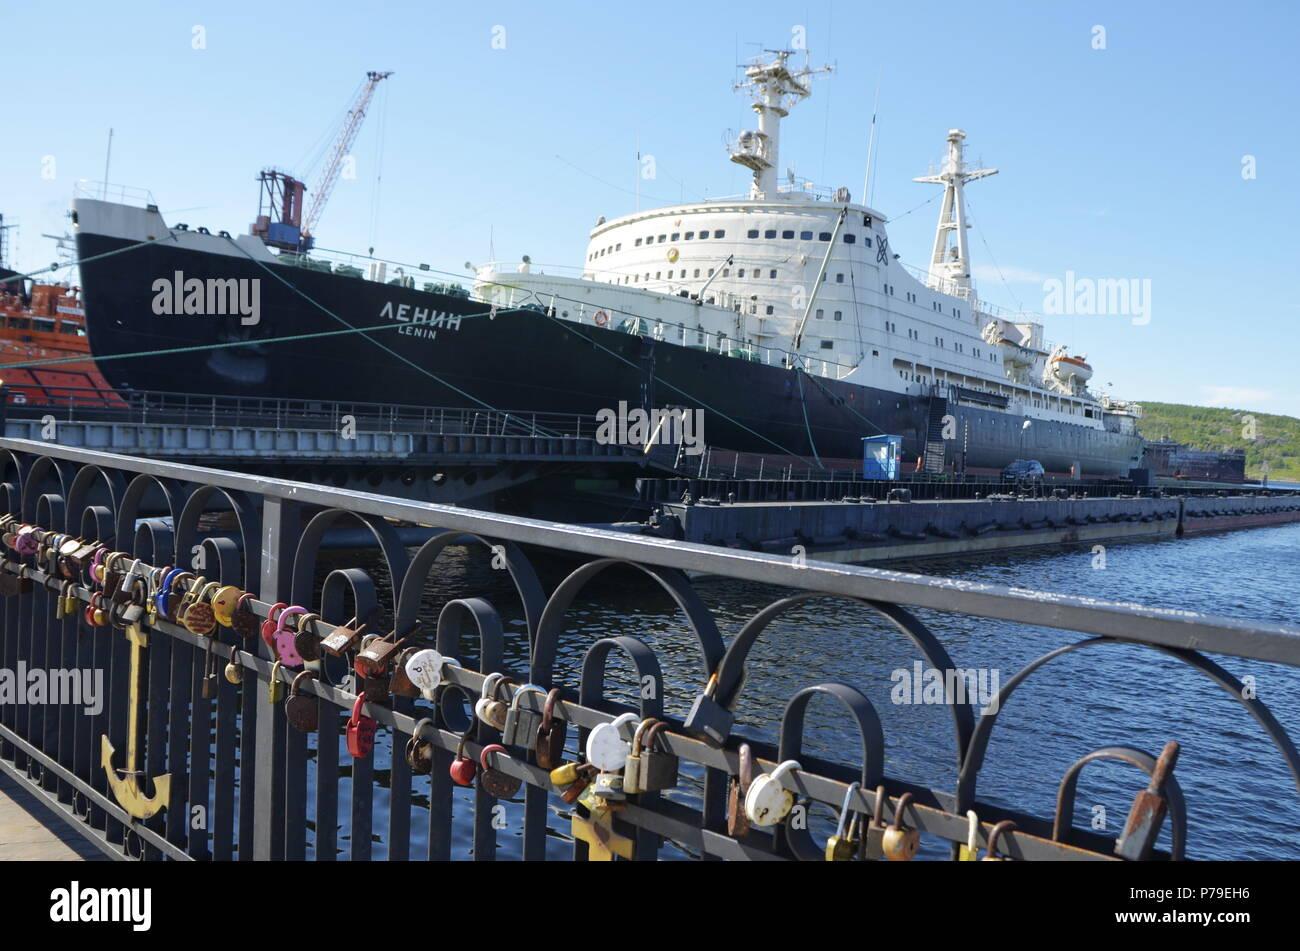 Lenin Nuclear Powered Ship in Murmansk, Russia - Stock Image